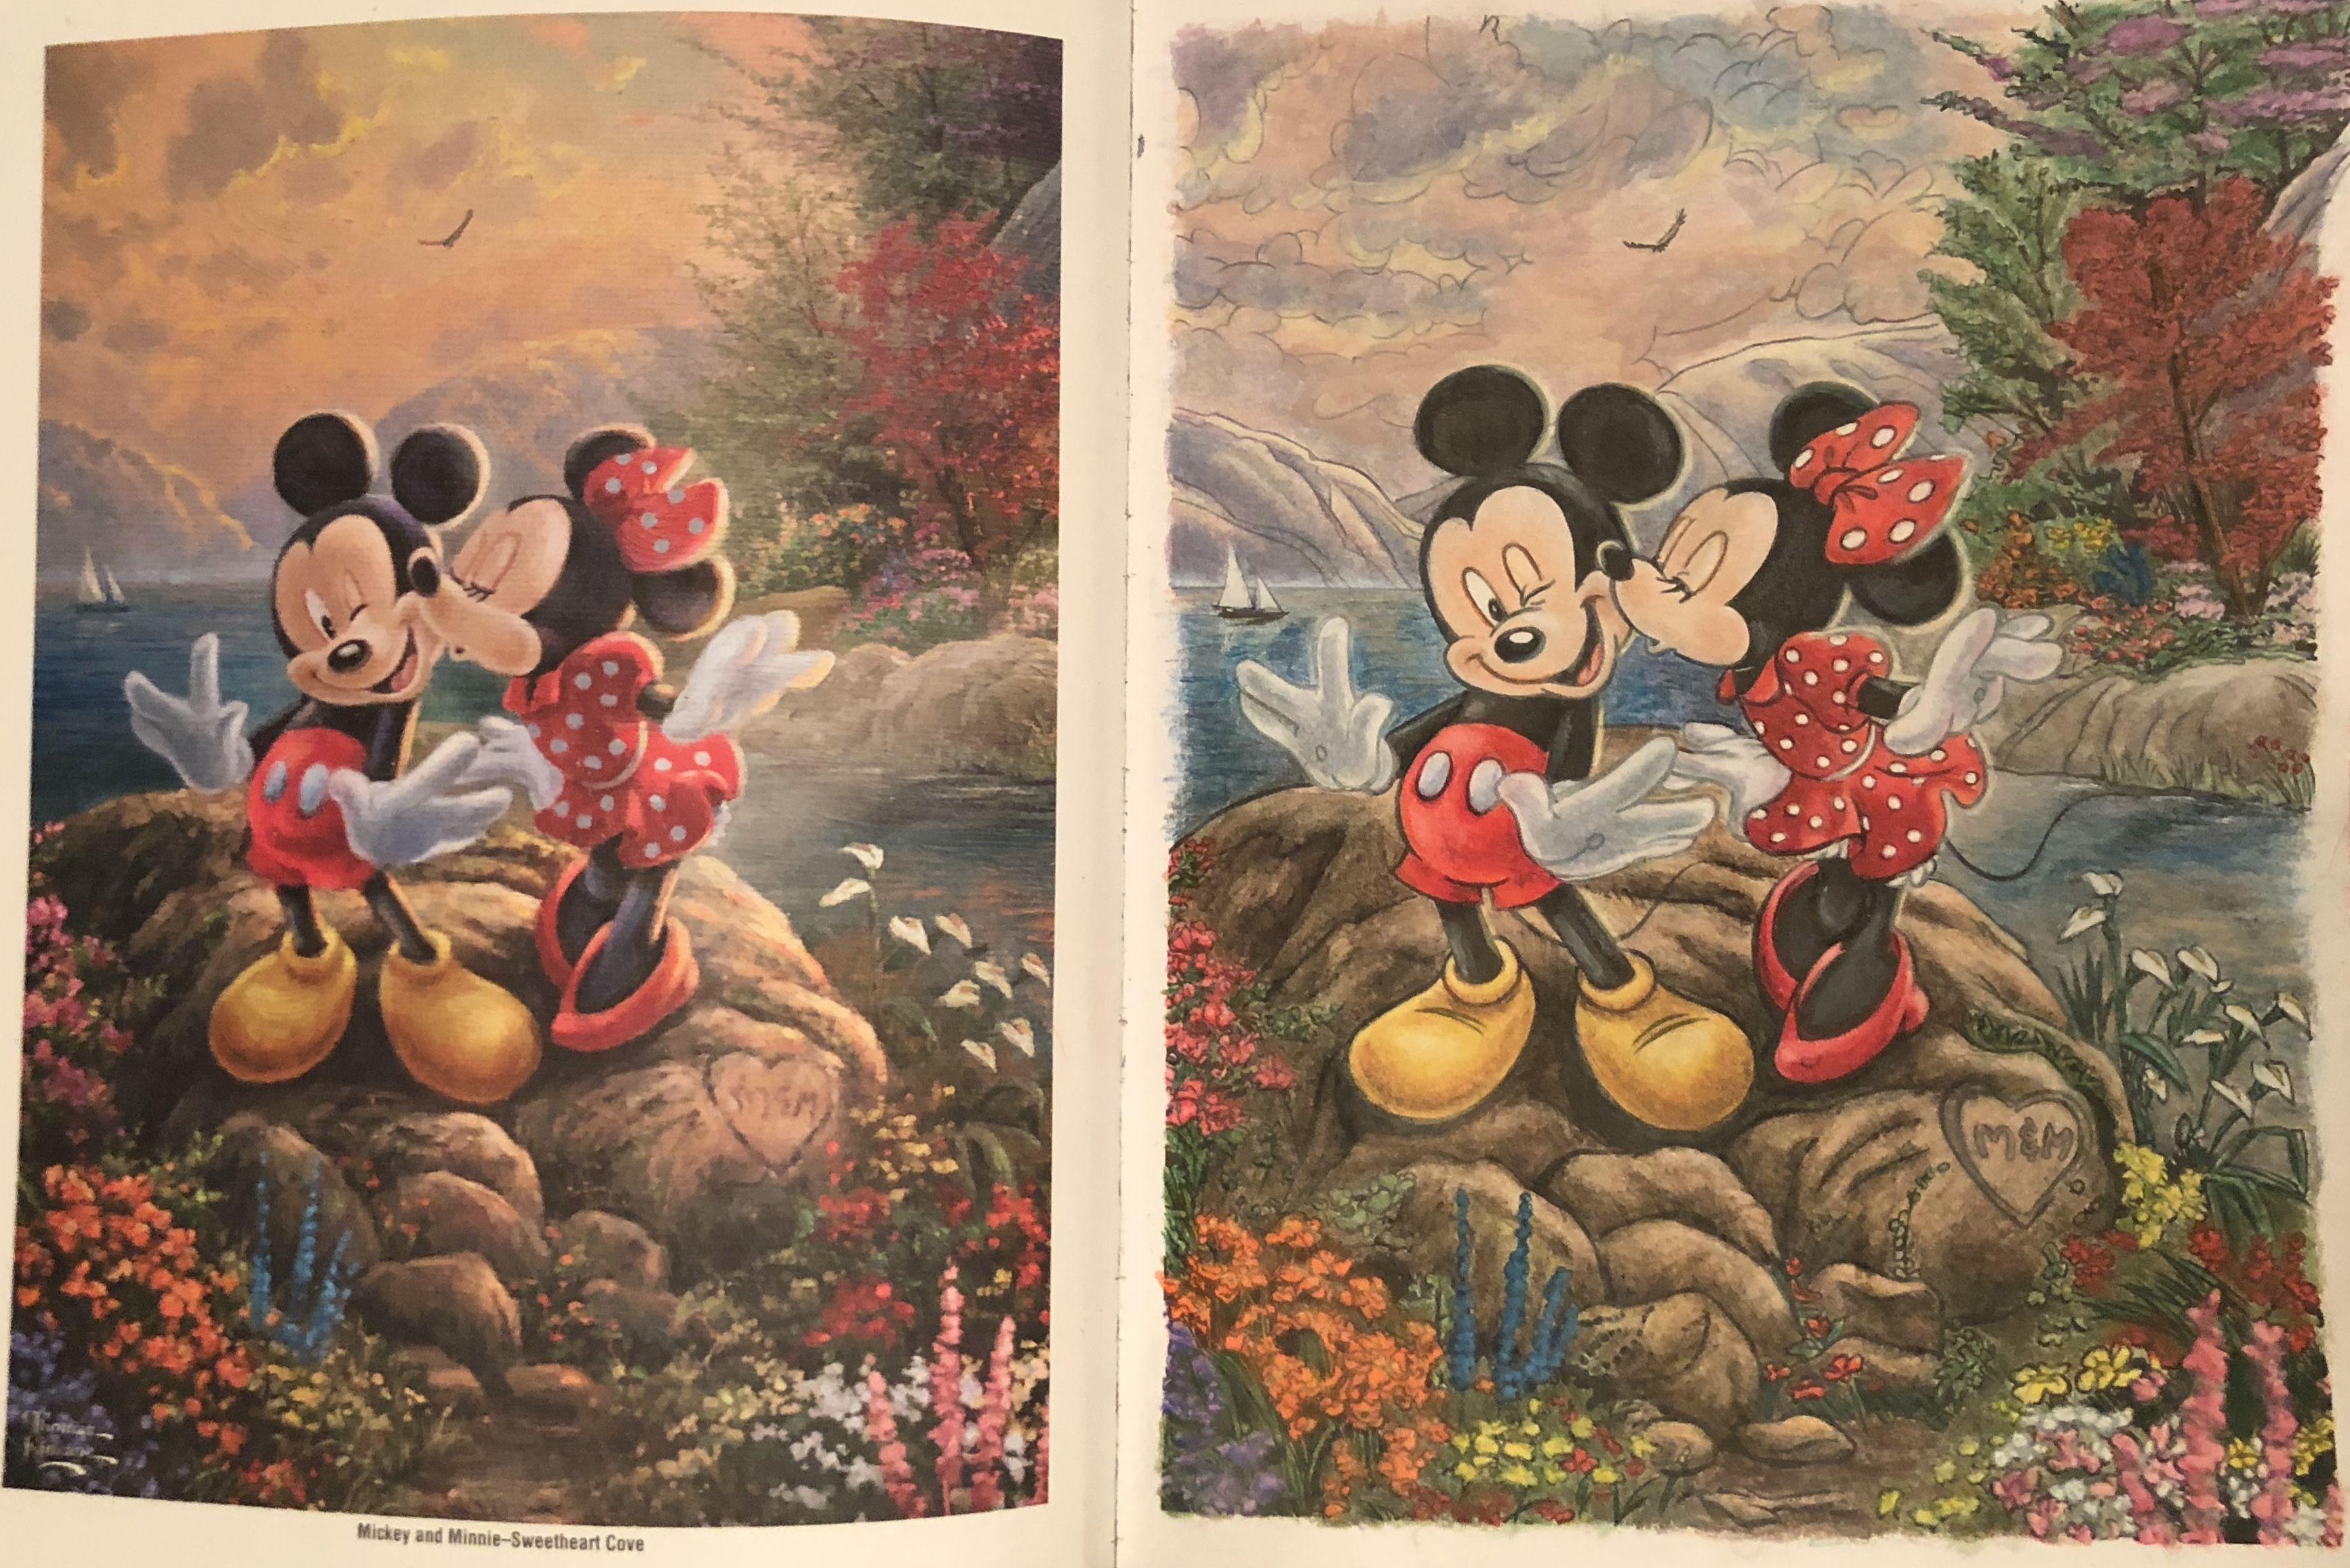 Disney Dreams By Thomas Kinkade Coloring Book Prismacolor And